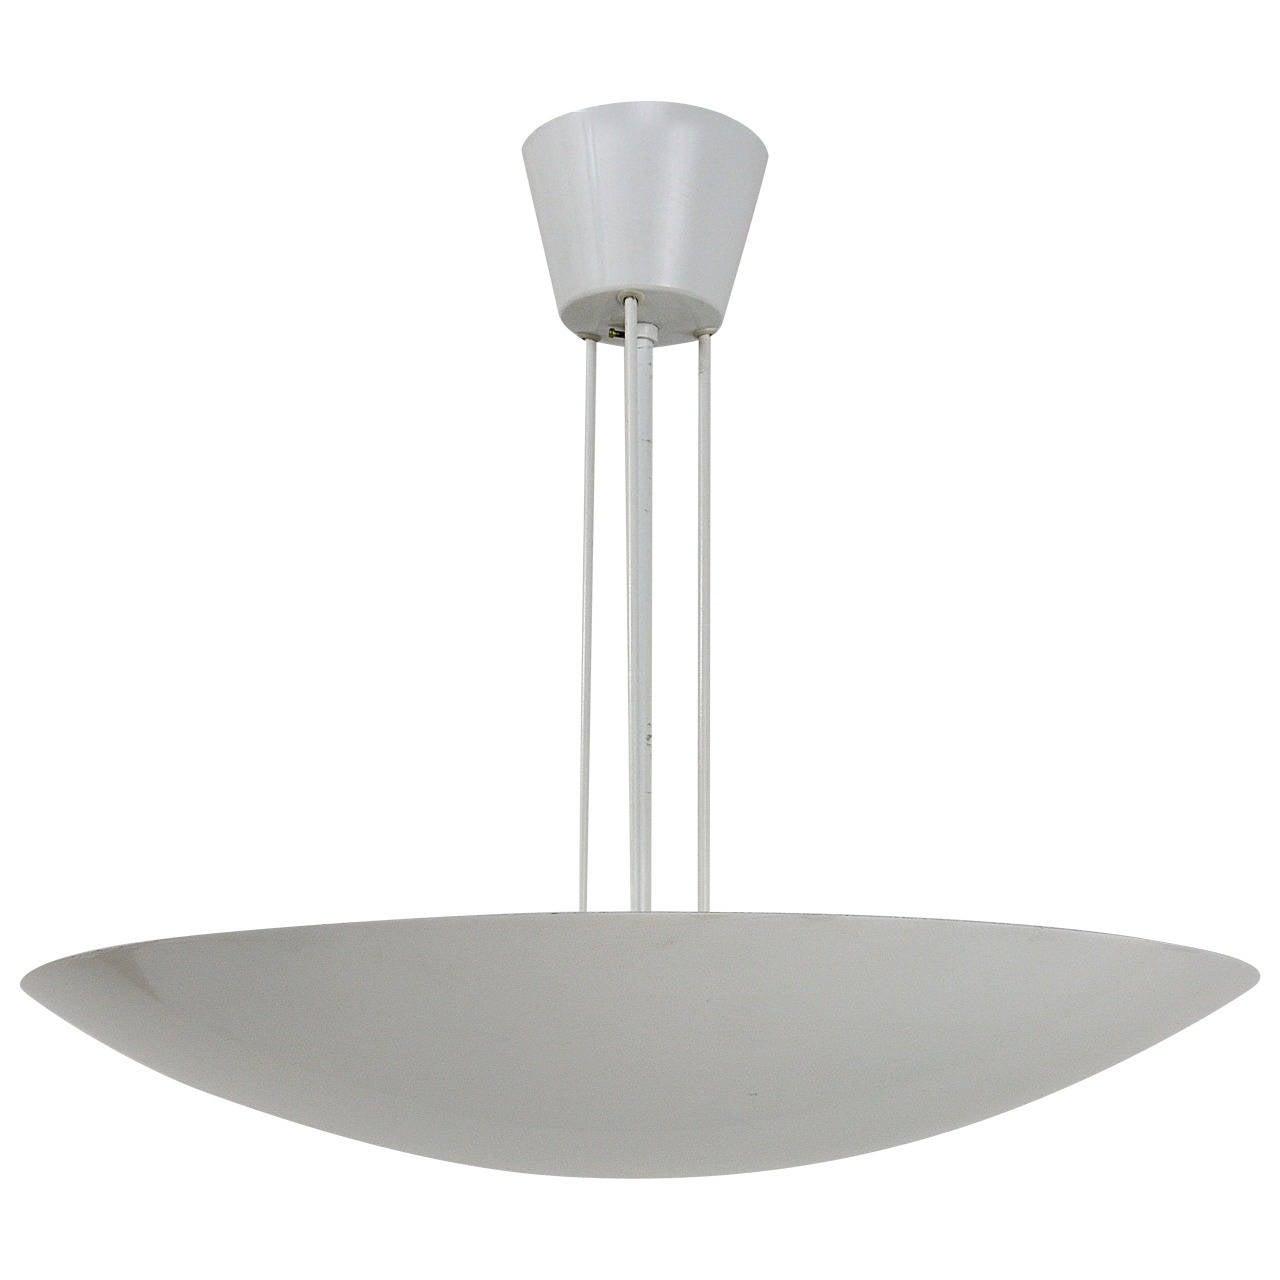 1 of 3 White Kalmar Uplight Bowl Pendant L&s Austria 1970s 1  sc 1 st  1stDibs & 1 of 3 White Kalmar Uplight Bowl Pendant Lamps Austria 1970s For ... azcodes.com